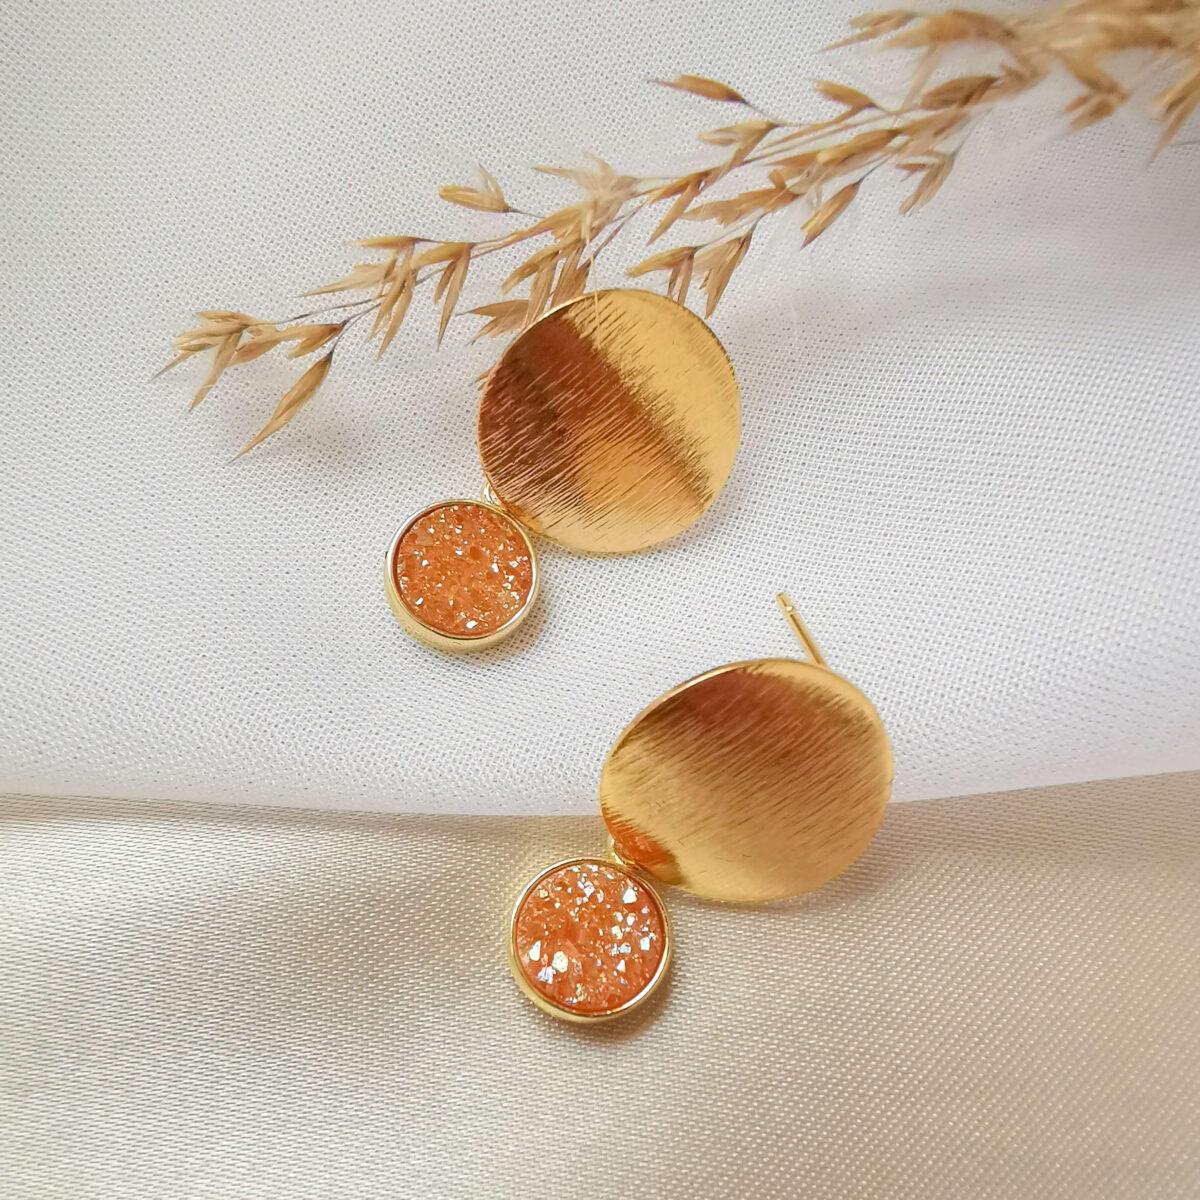 AccentsUK SARIKA Golden Peach 18k Gold Plated Earrings